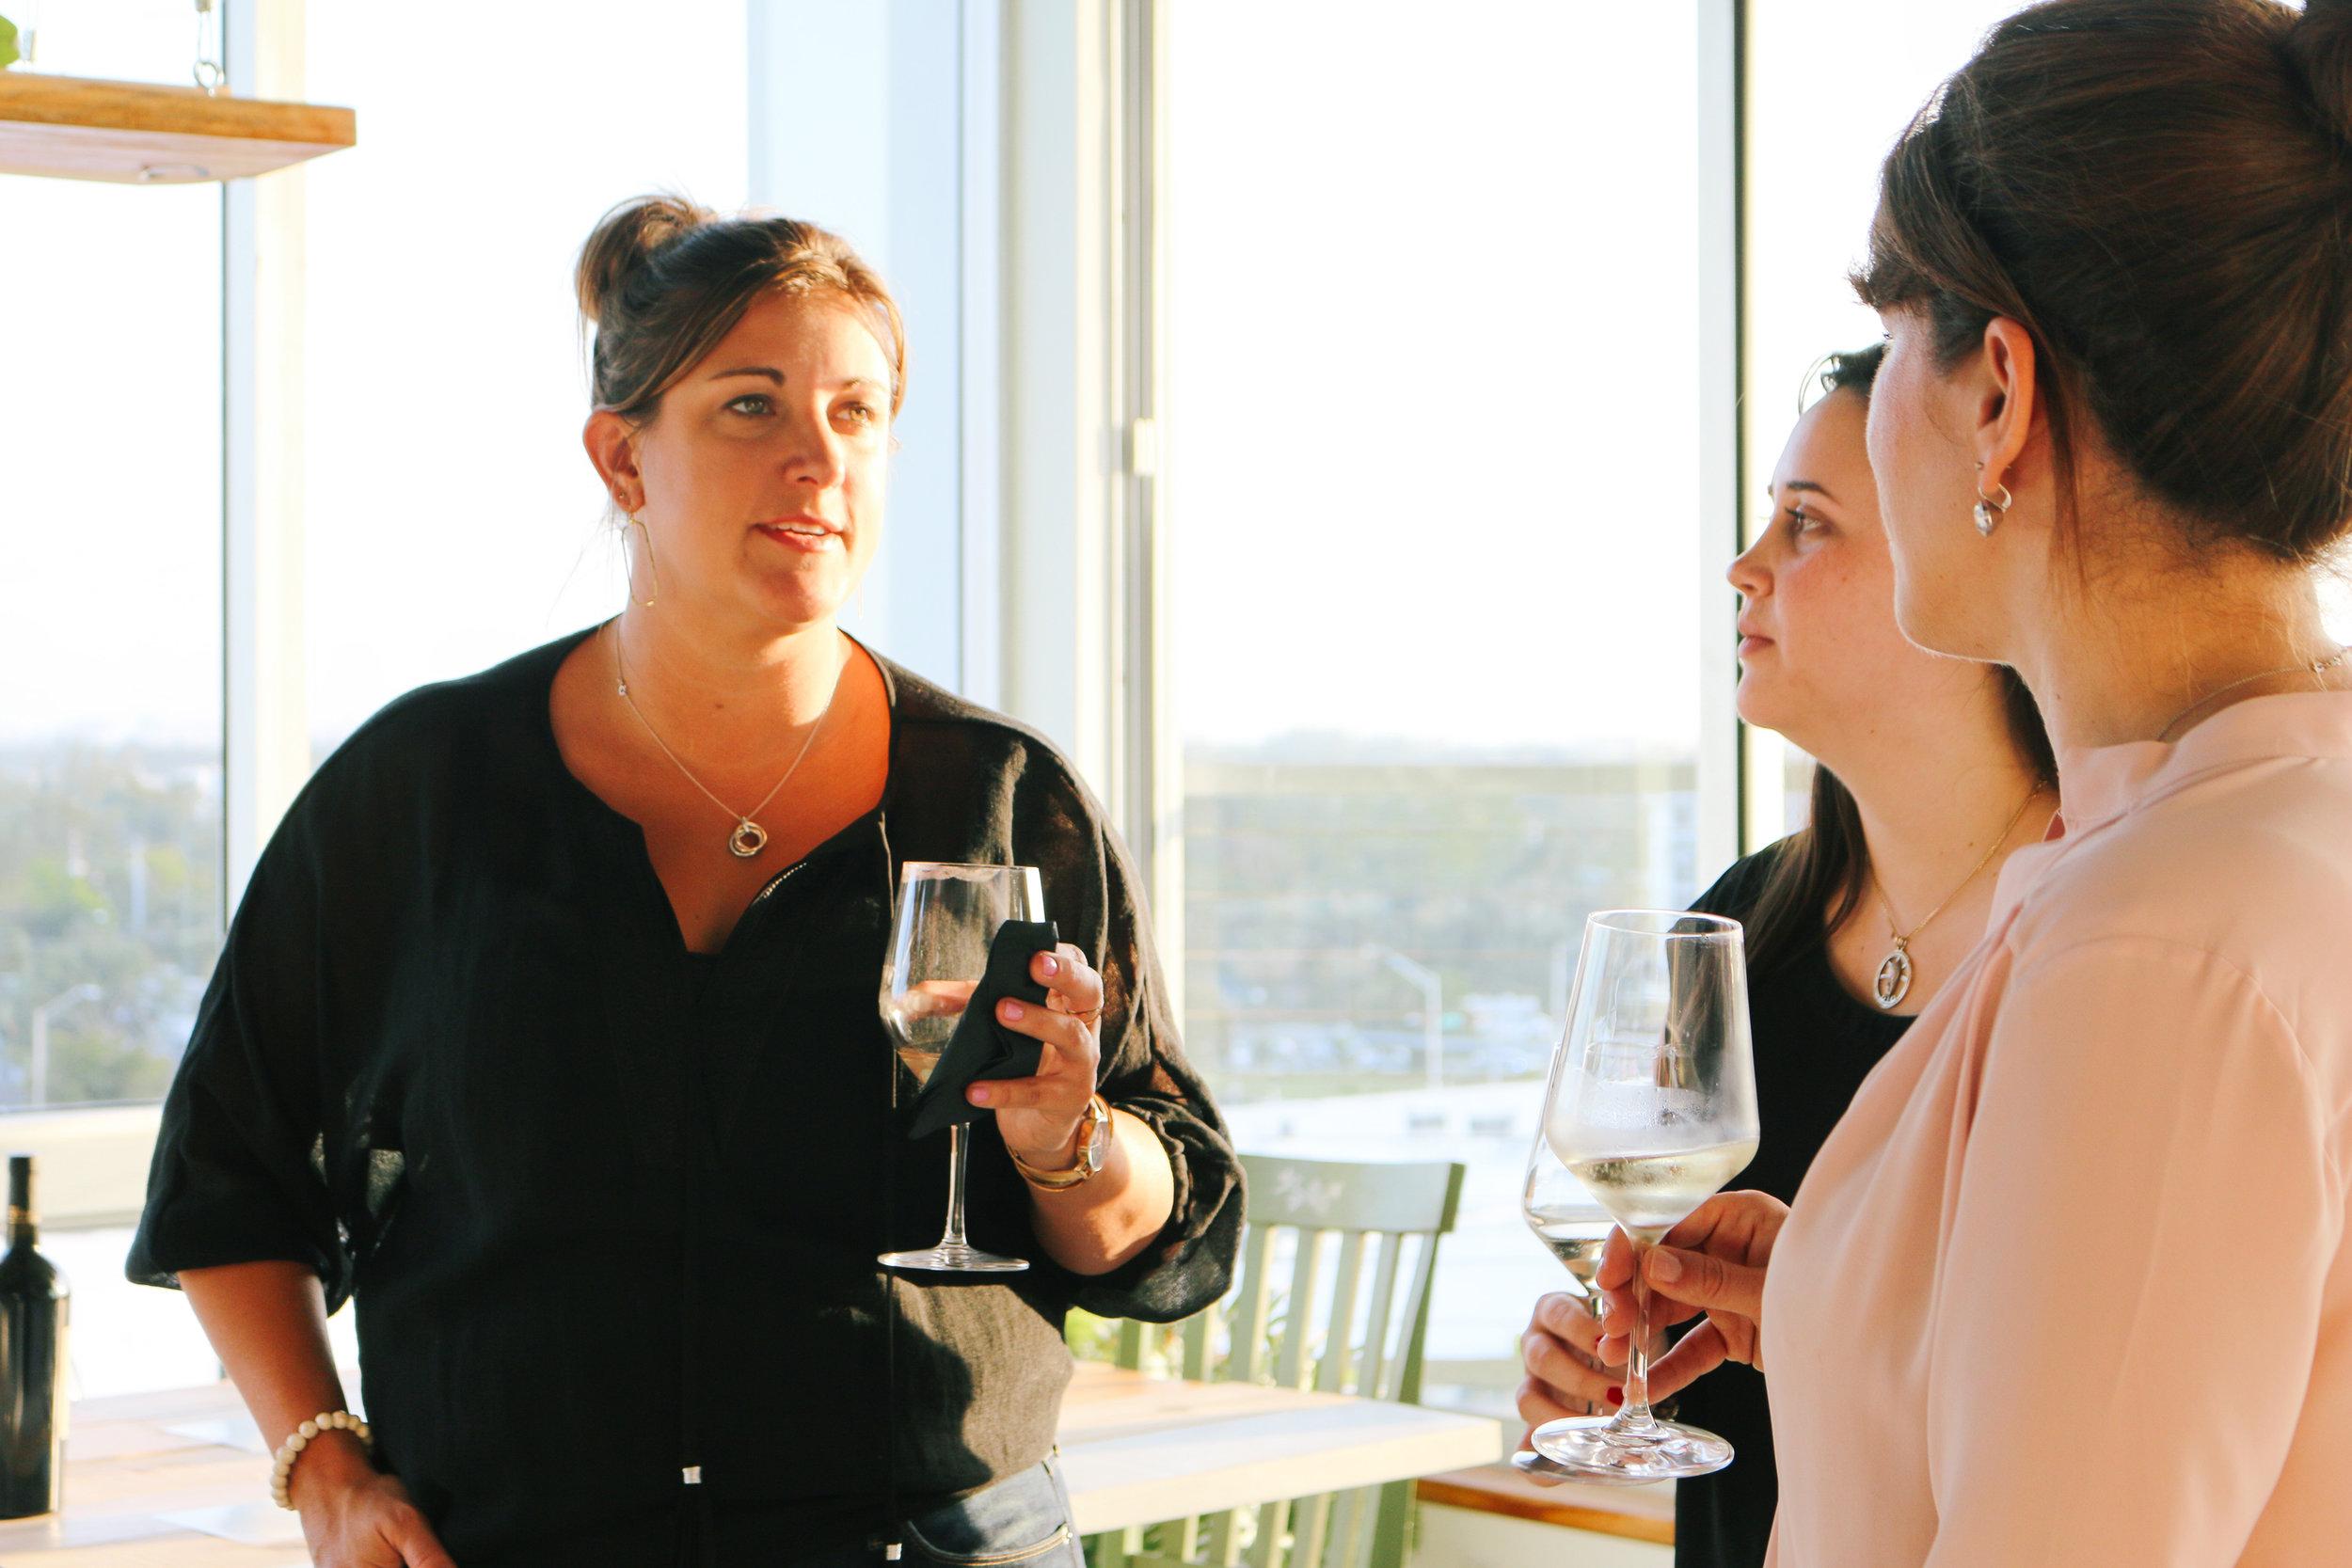 Women Who Wine Uncorked Conversations-Miami Wine Events-Wine Tasting Miami-16.jpg